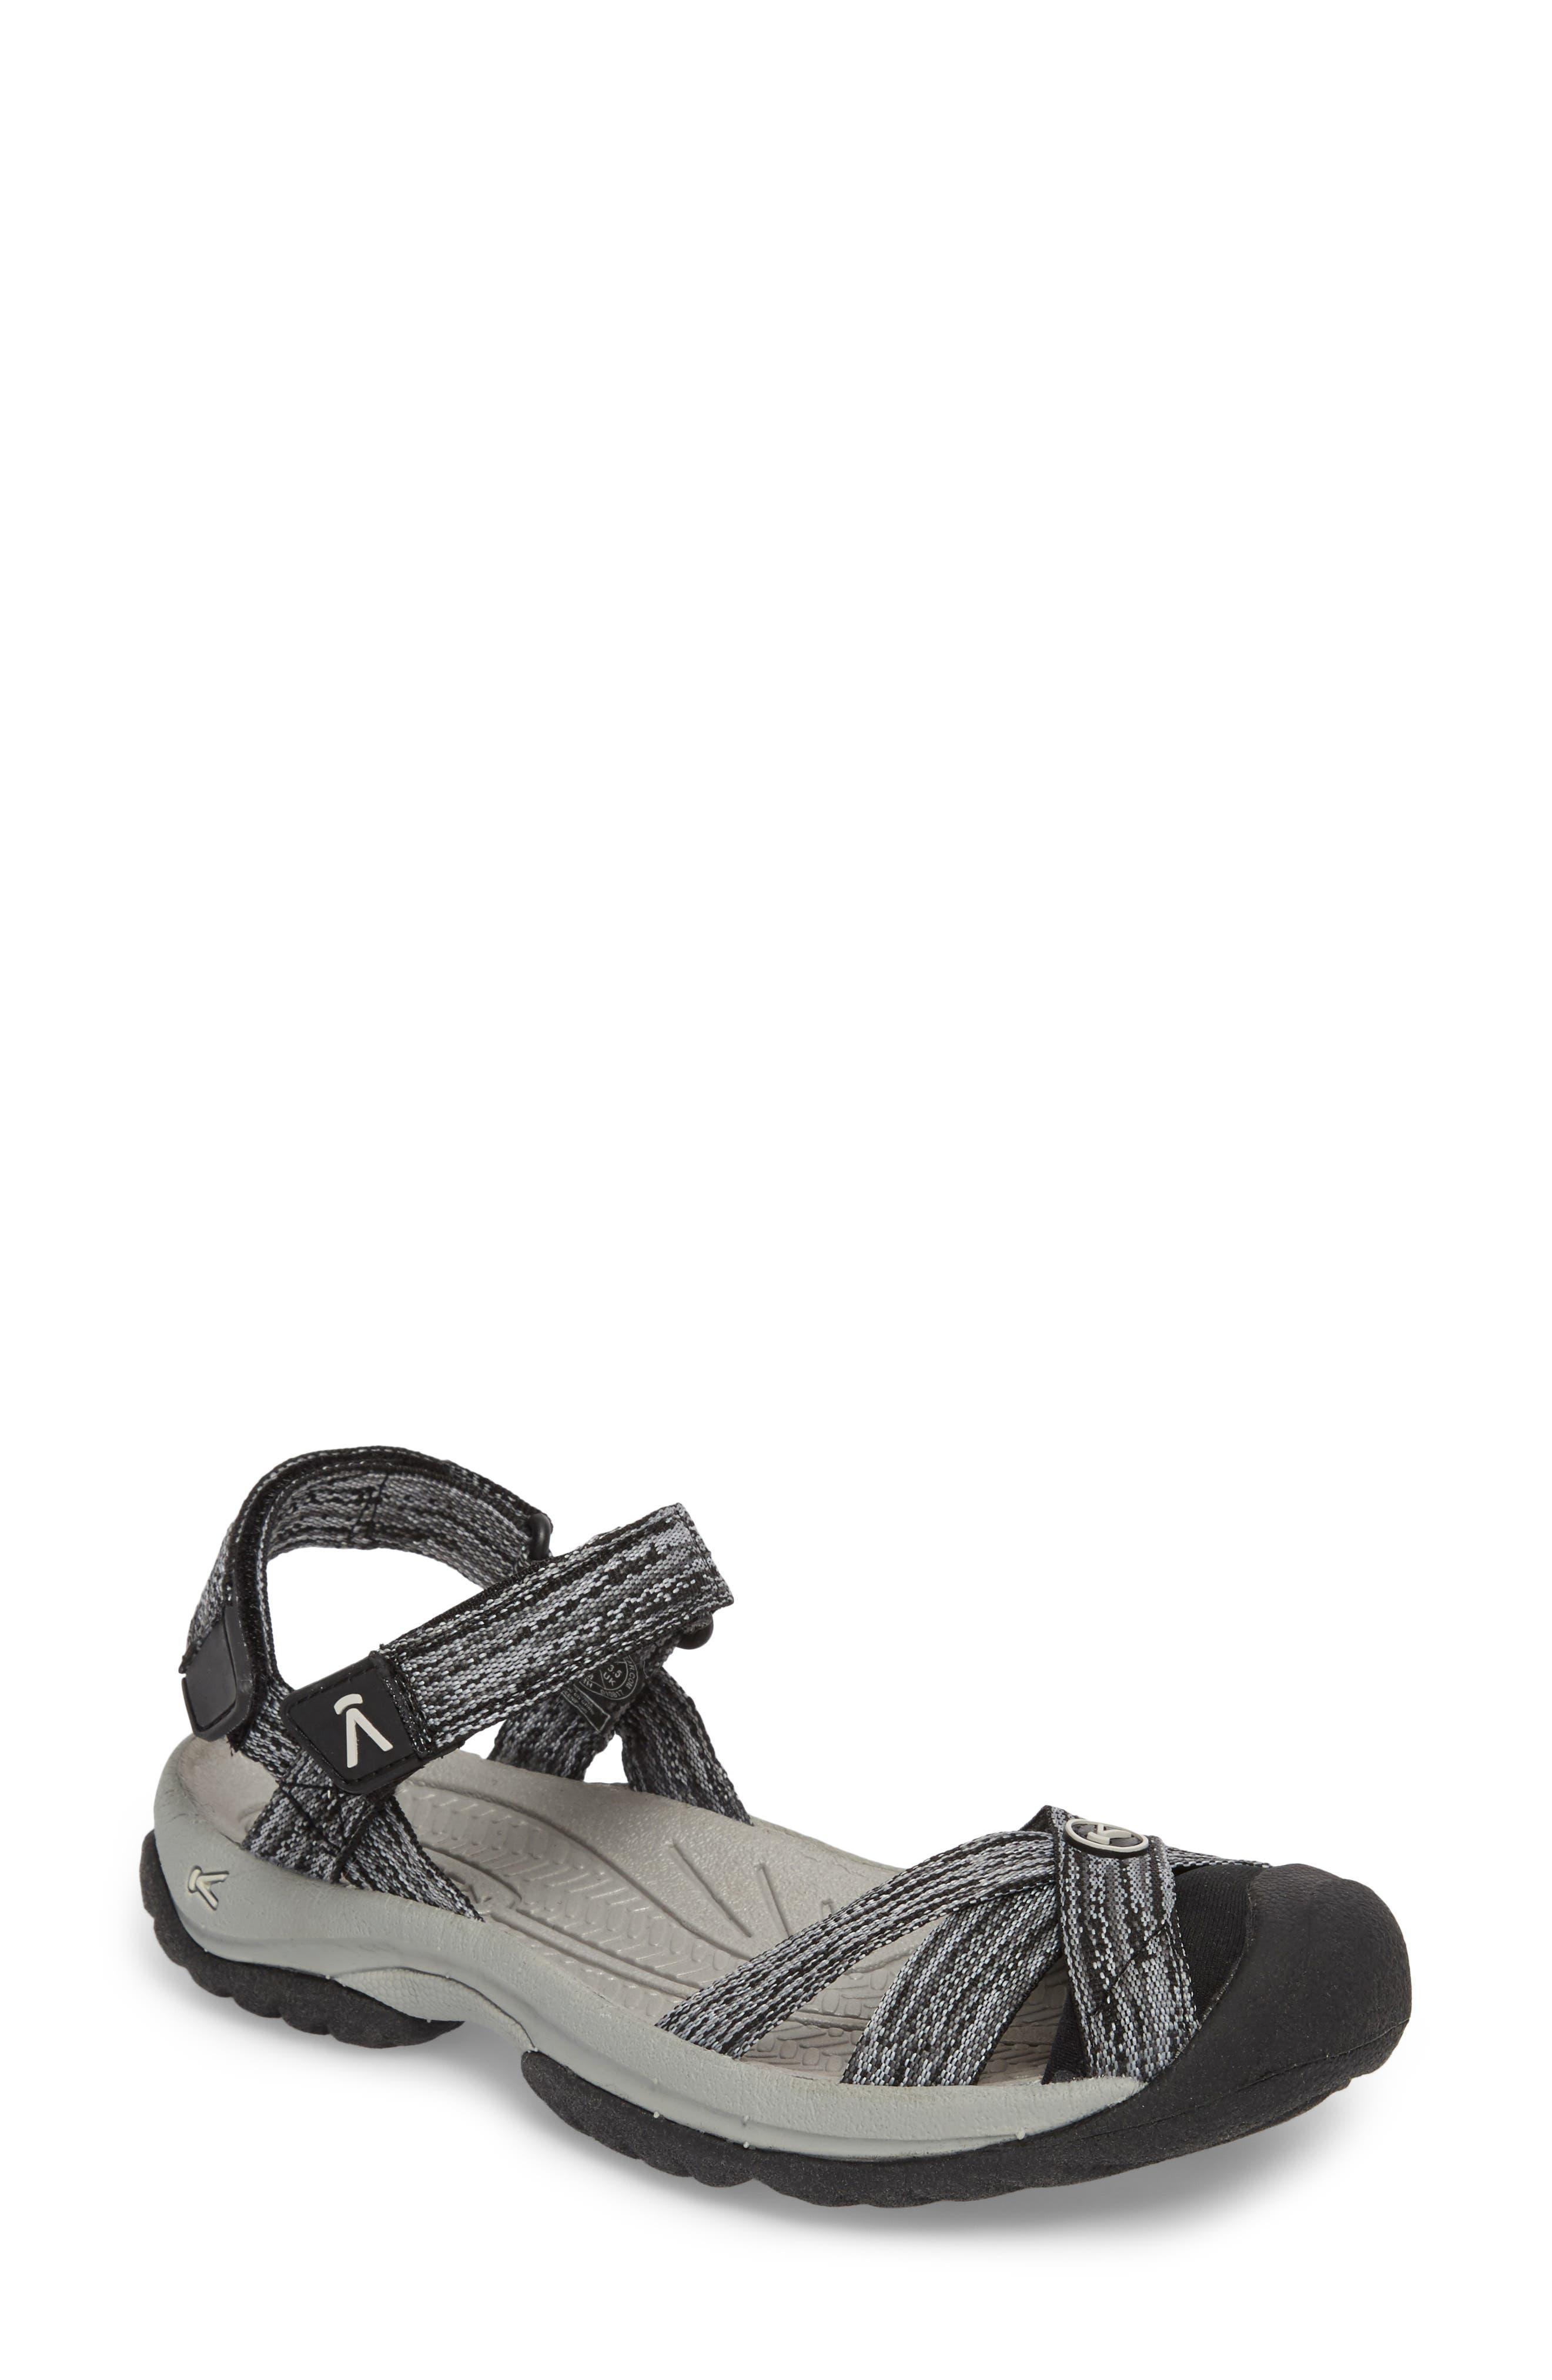 Bali Sandal,                             Main thumbnail 1, color,                             NEUTRAL GRAY/ BLACK